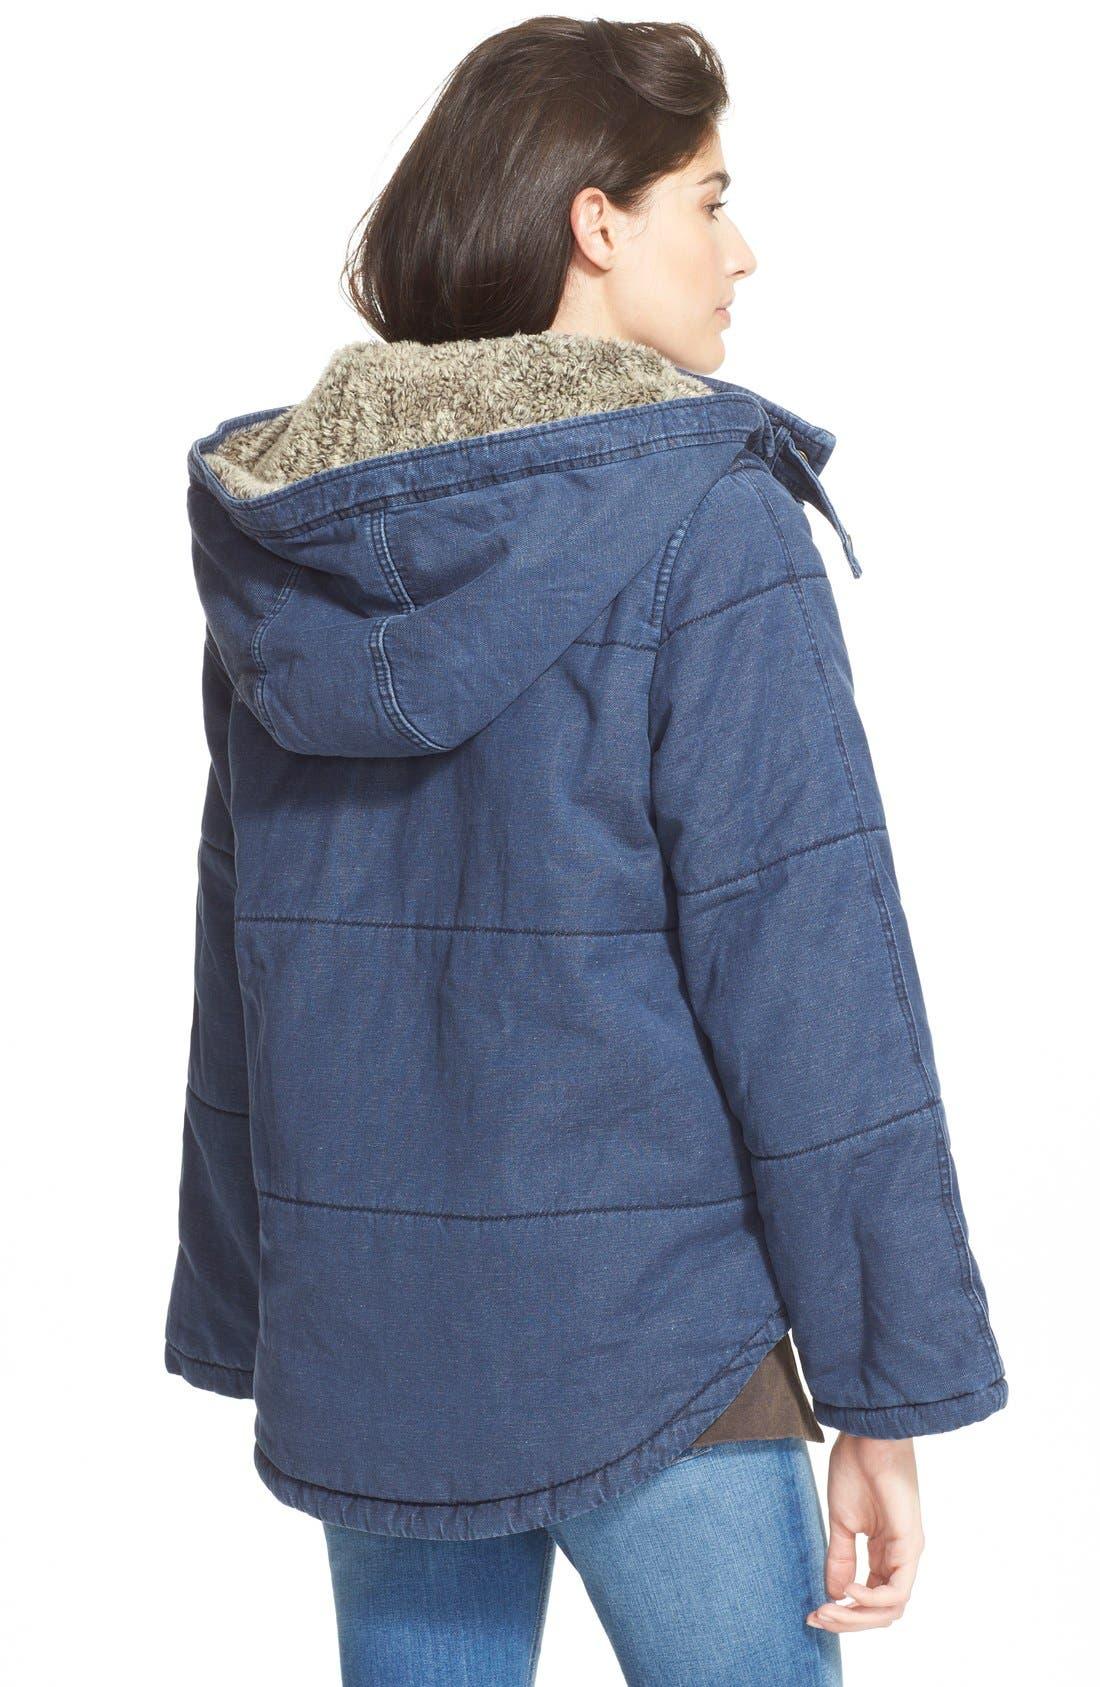 Quilted Denim Jacket,                             Alternate thumbnail 6, color,                             407